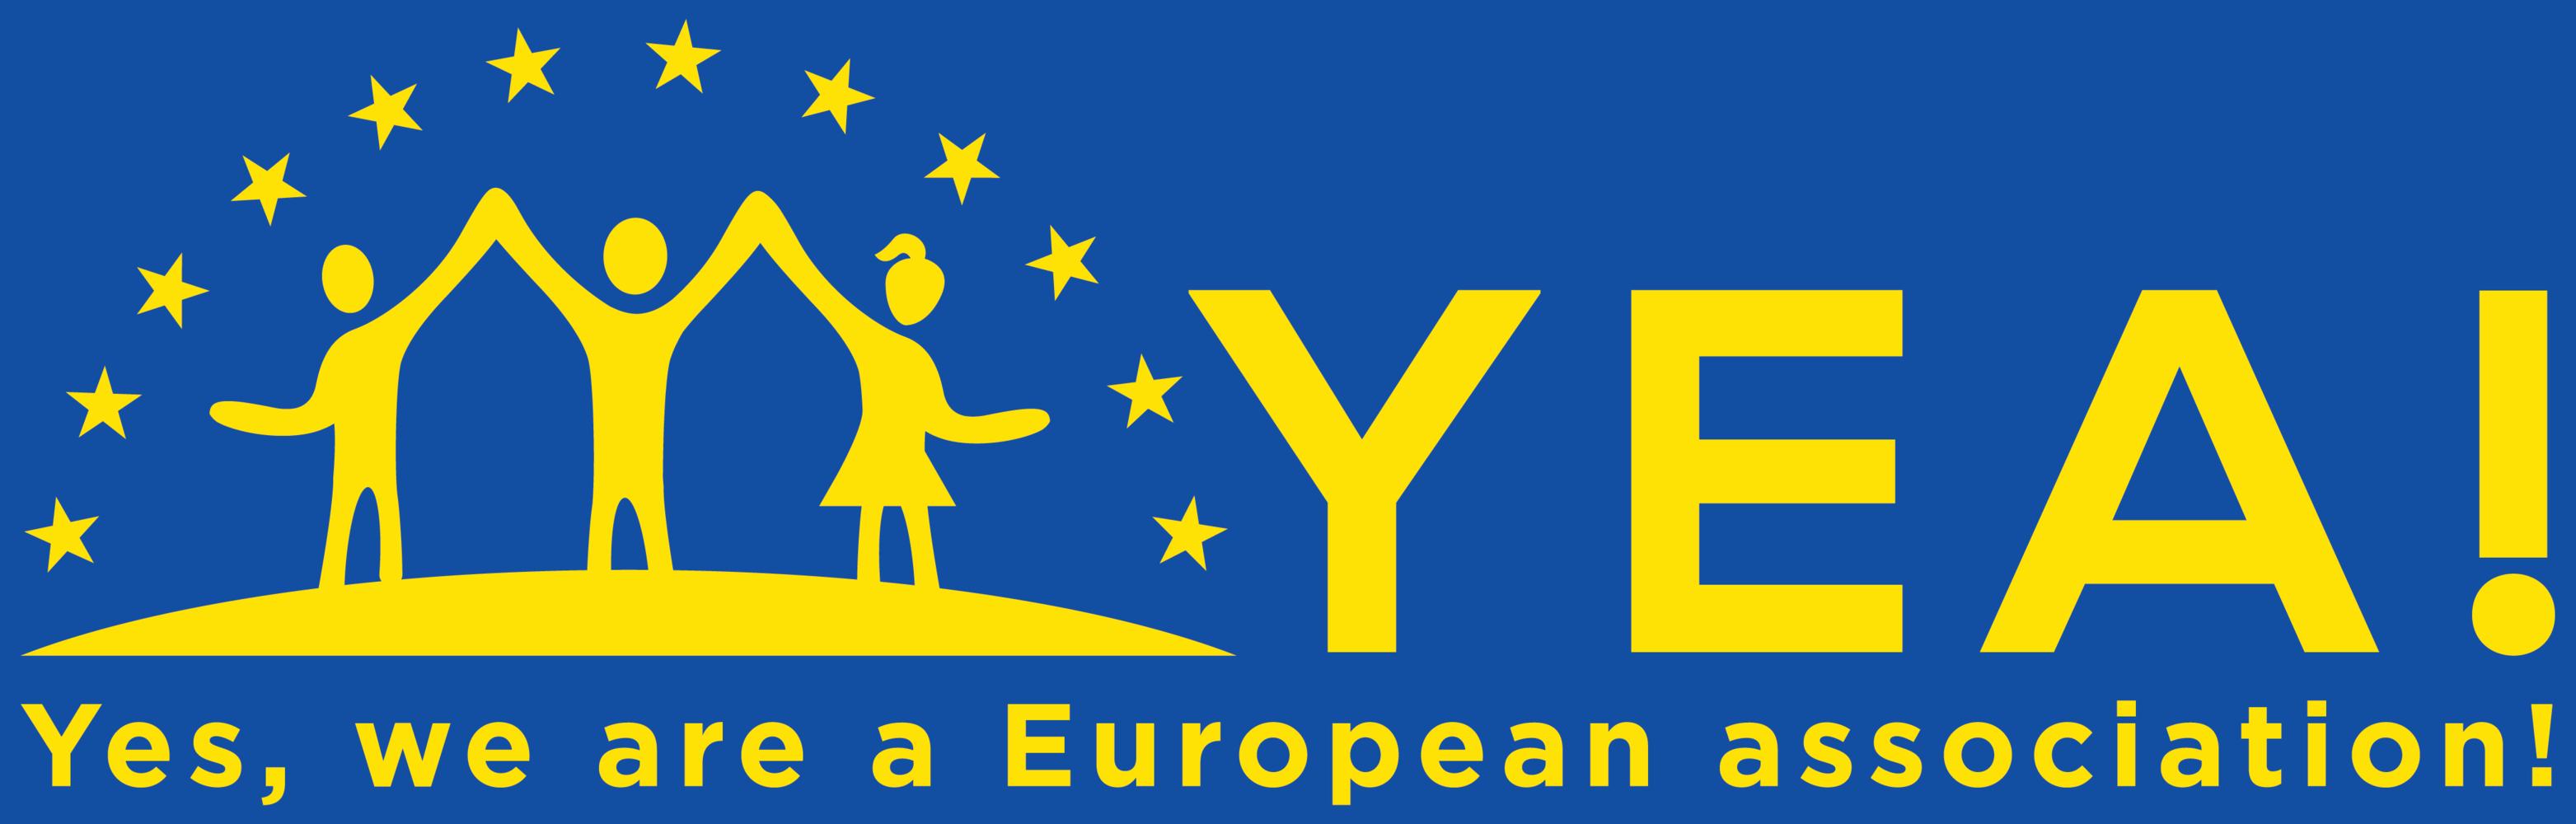 YEA!-04.png